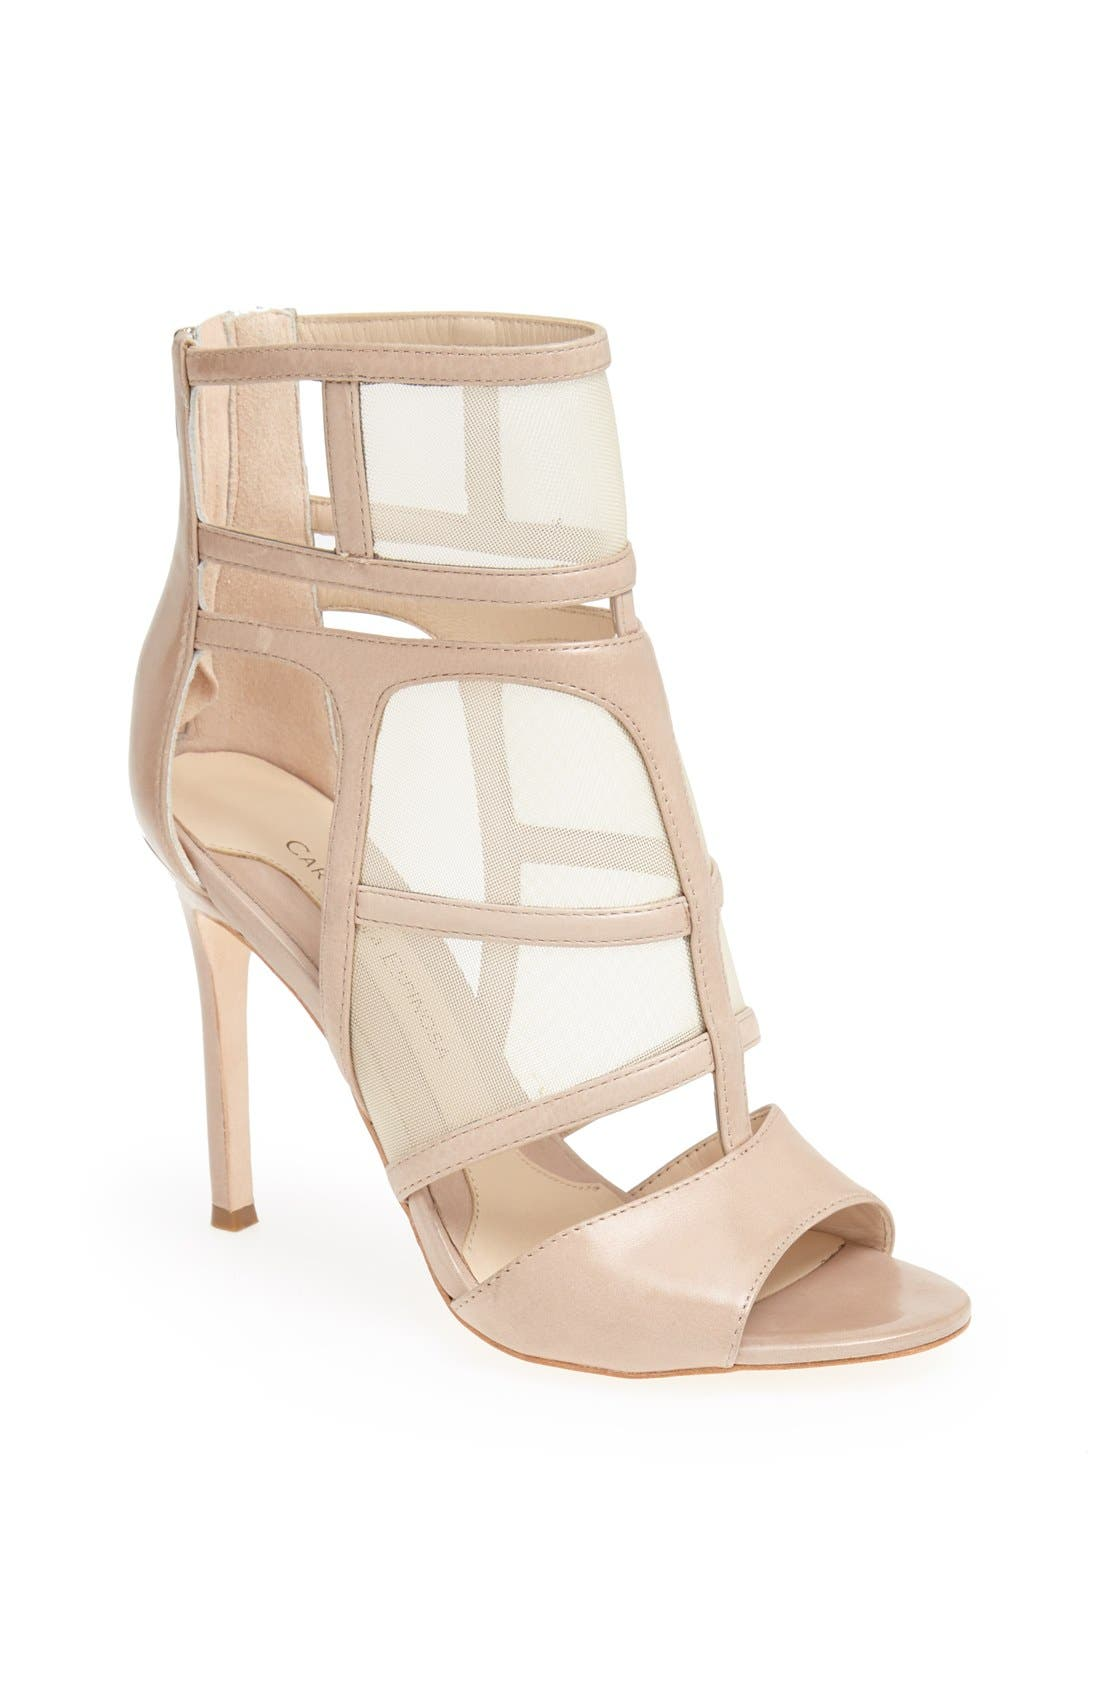 Alternate Image 1 Selected - Carolinna Espinosa 'Sammy' Leather Sandal